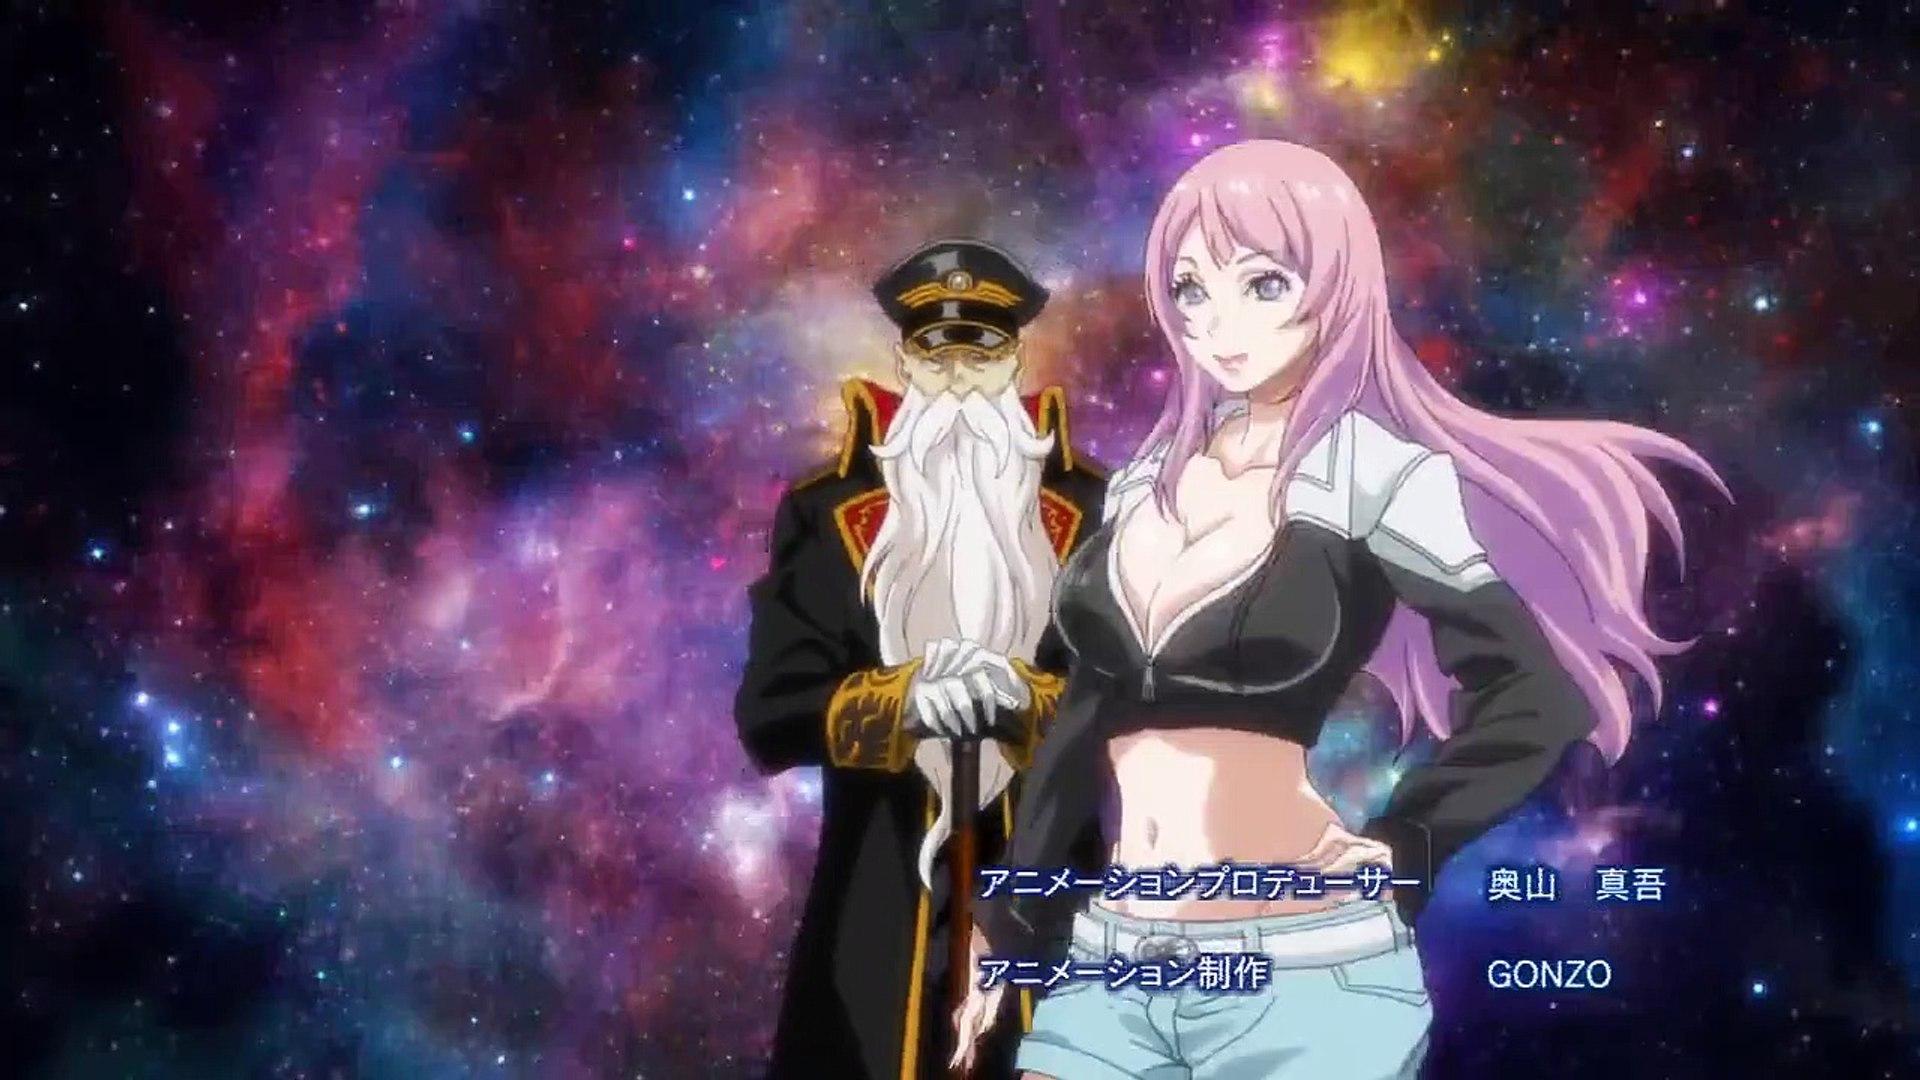 Space Battleship Tiramisu ep 2  Watch anime online, Watch cartoon online, English dub anime